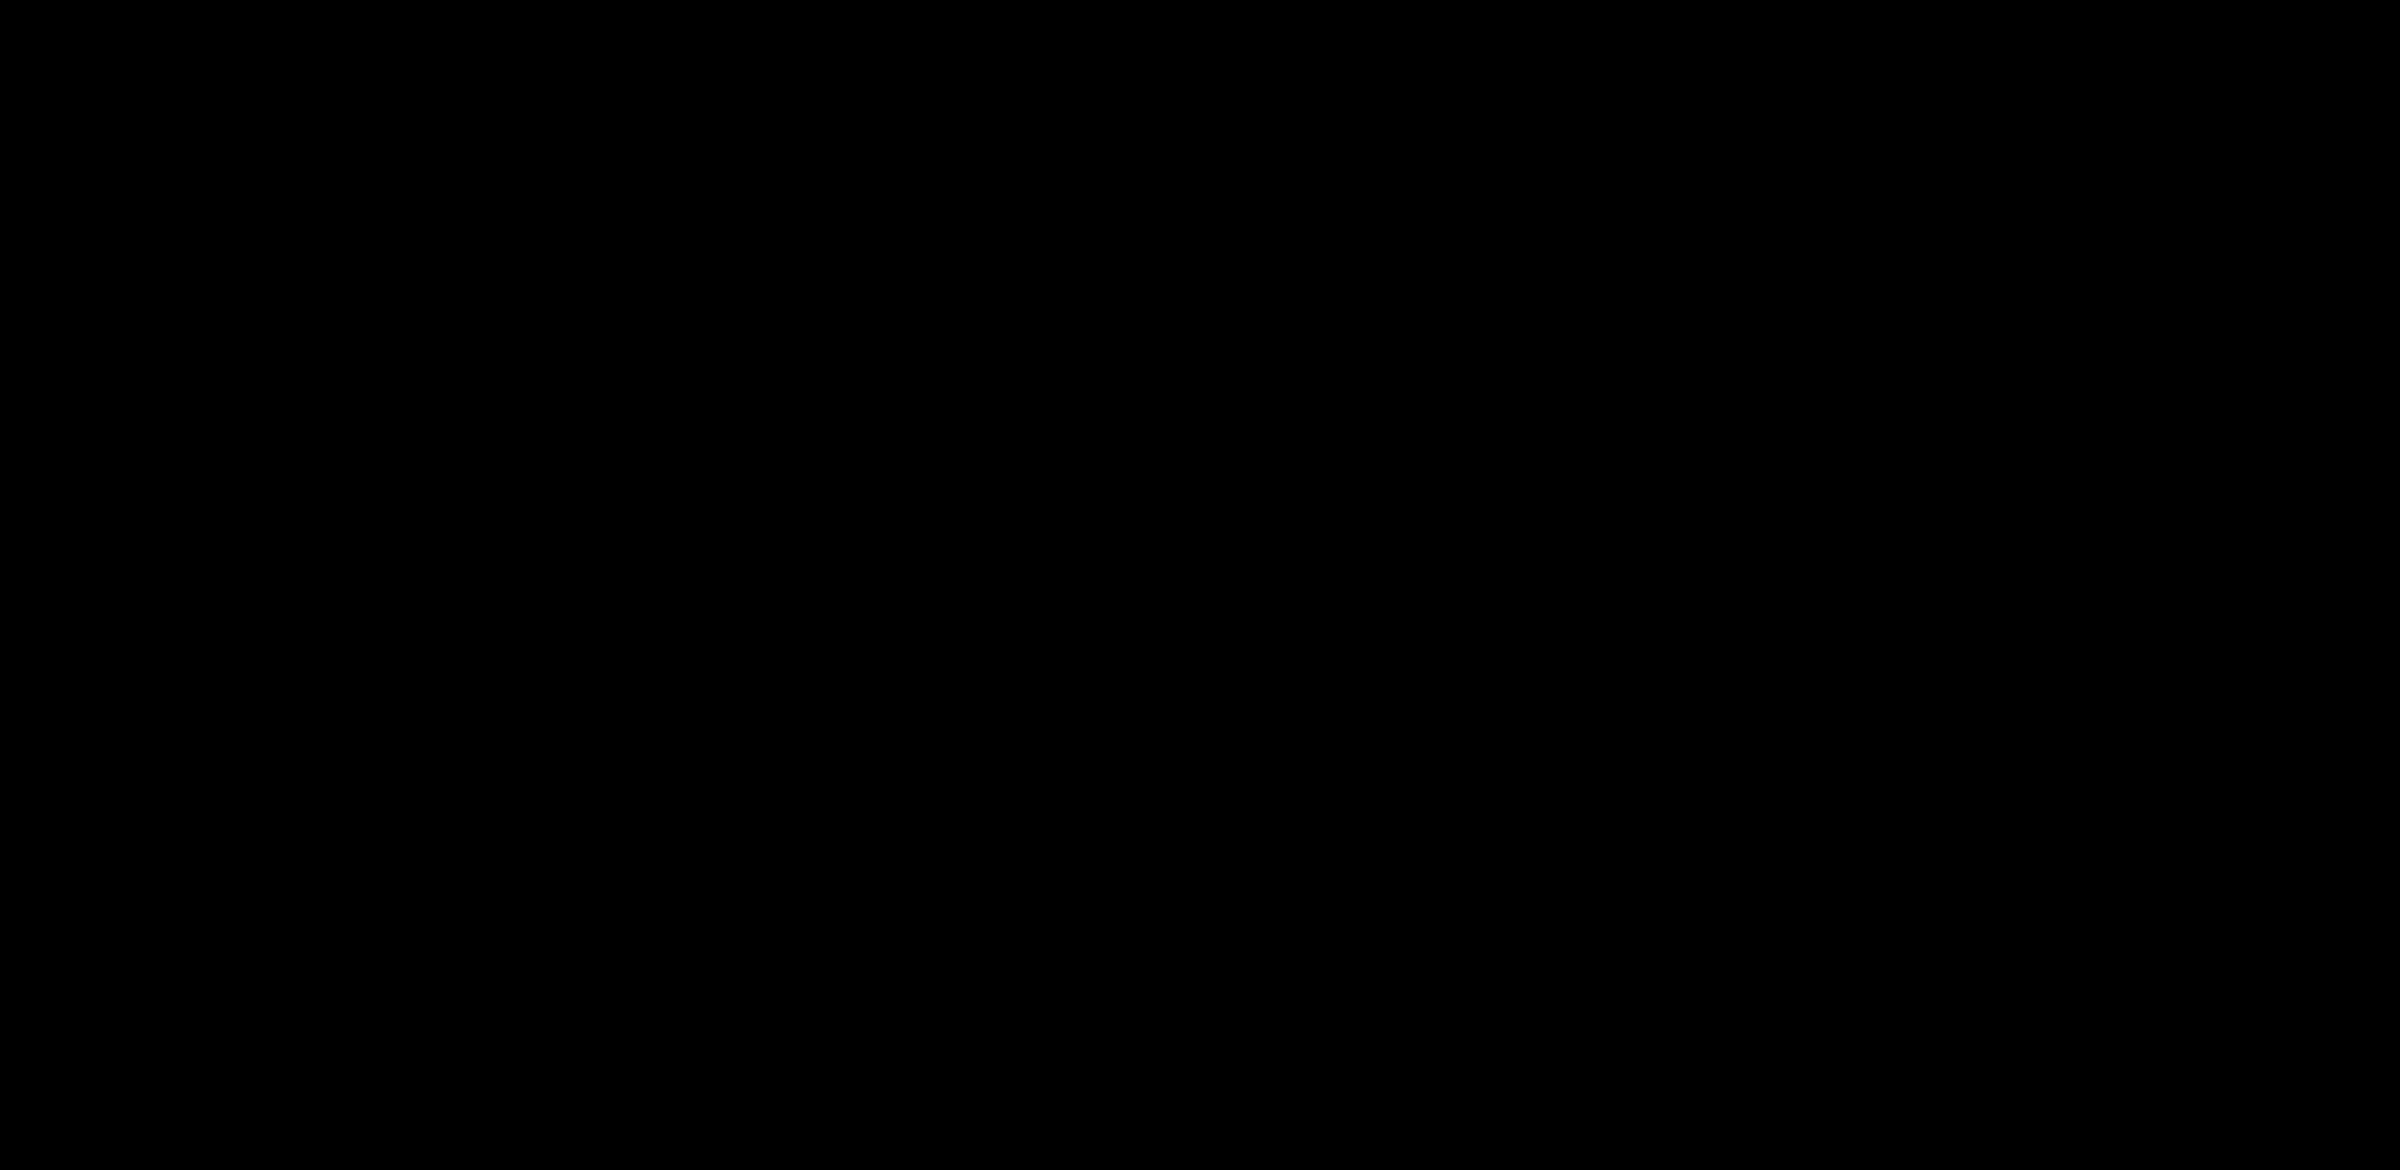 2400x1170 Clipart